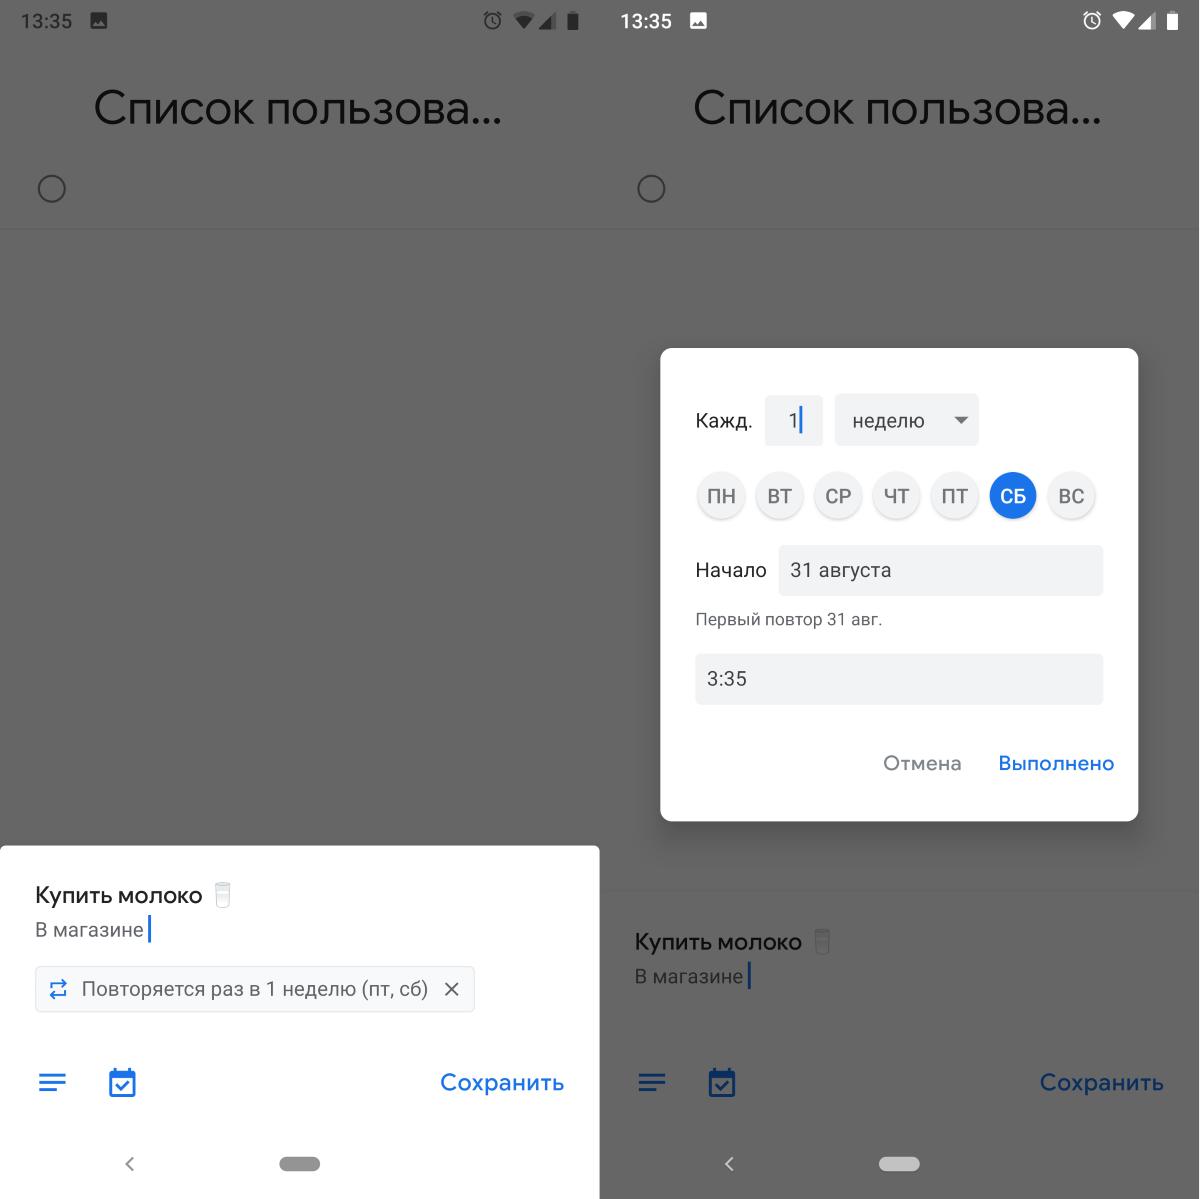 Create a task in Google Tasks